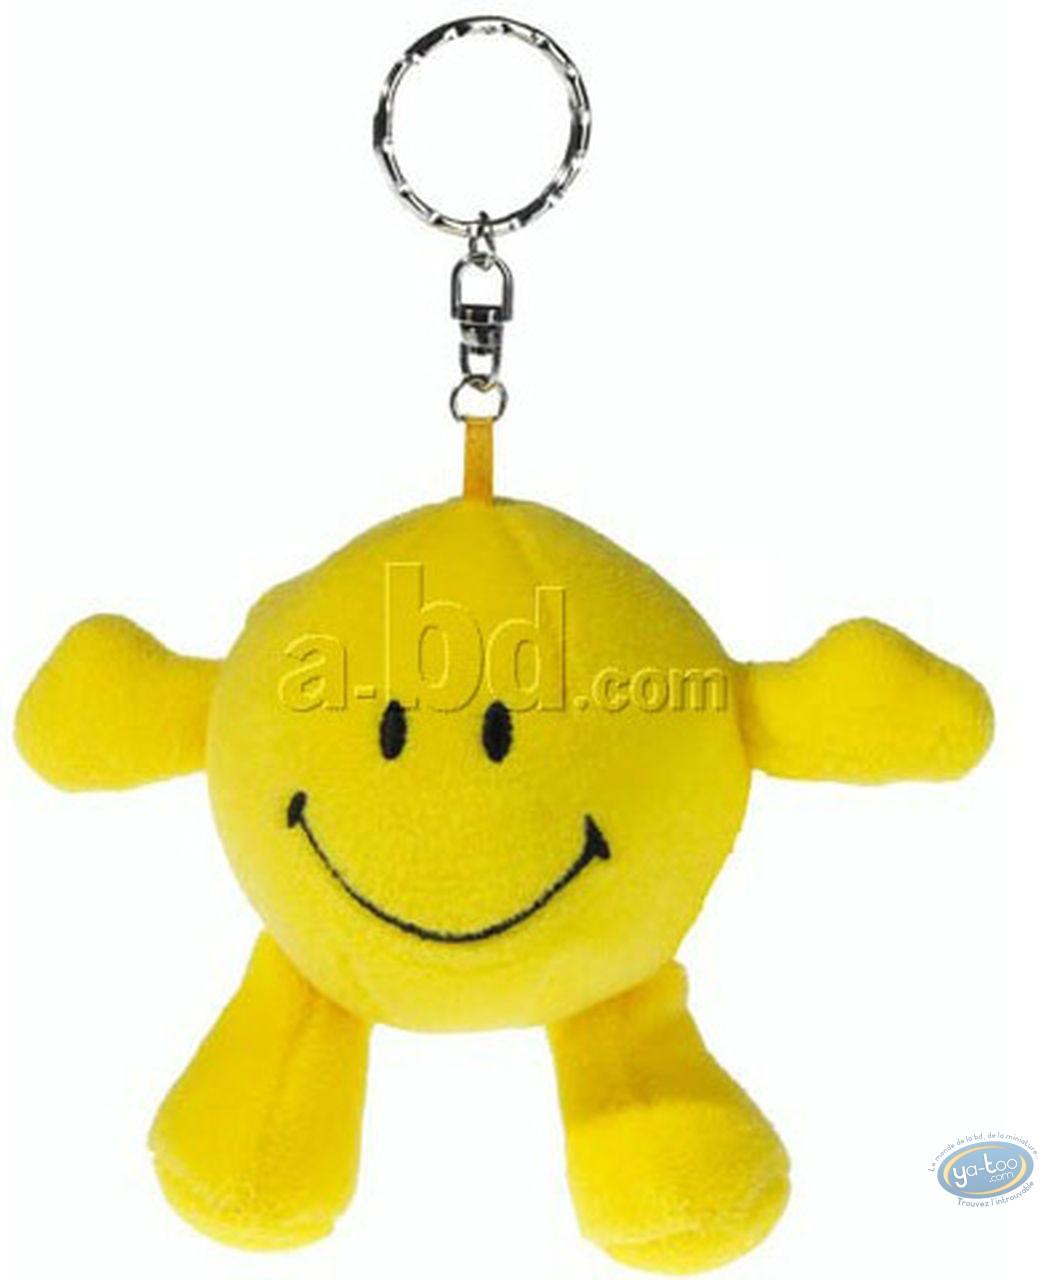 Porte-clé, Smiley : Peluche Smiley